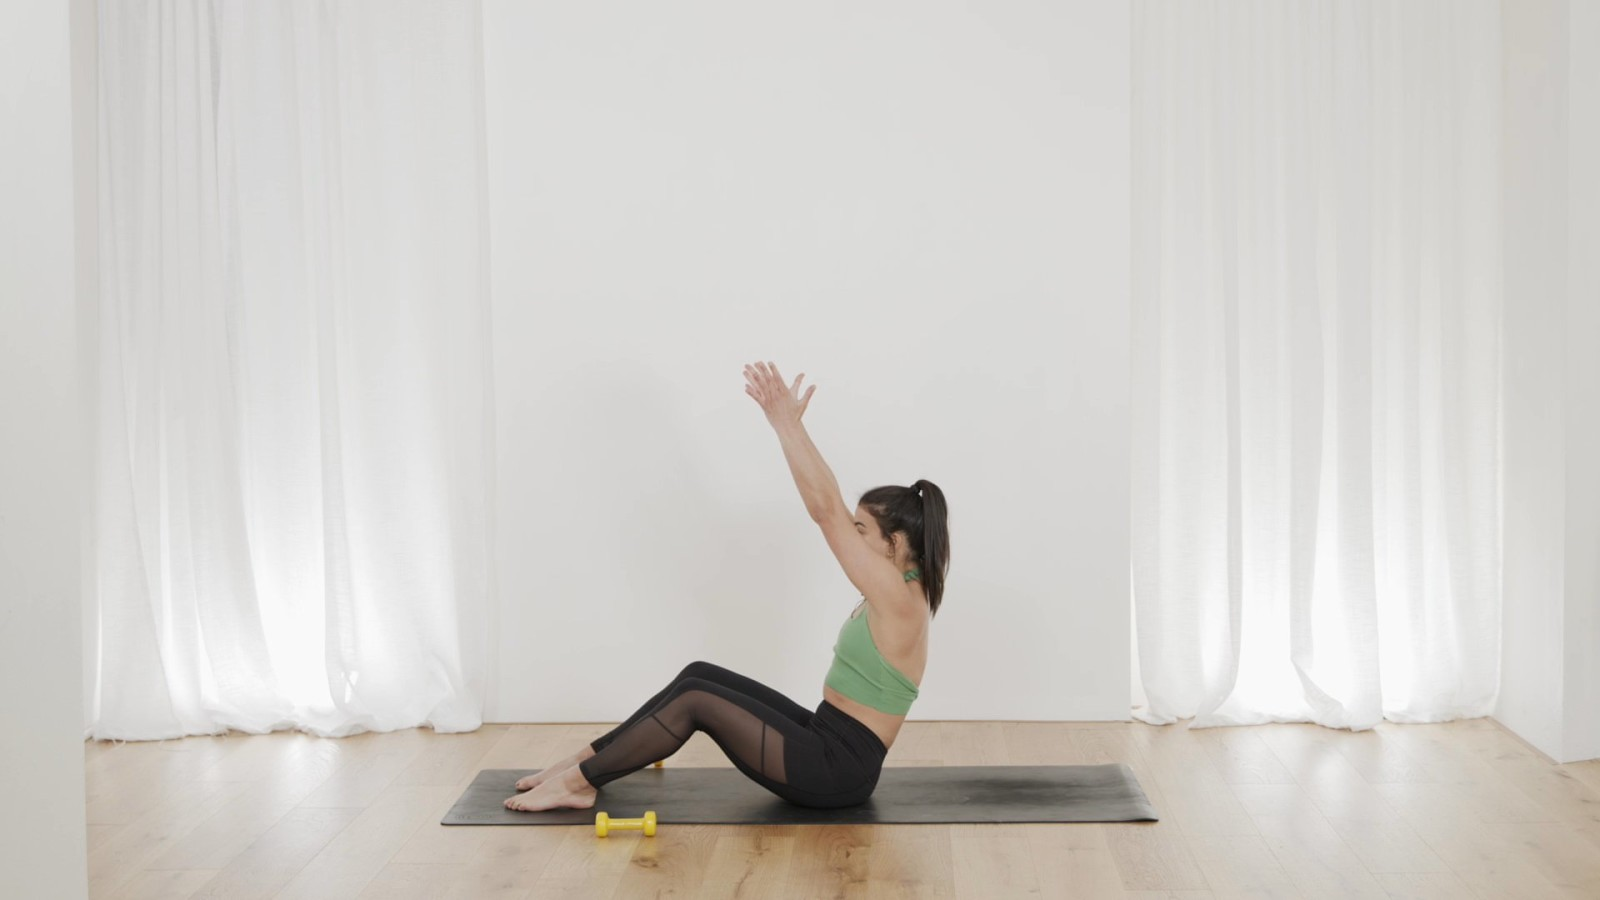 Full Body Pilates with Ella Kauter